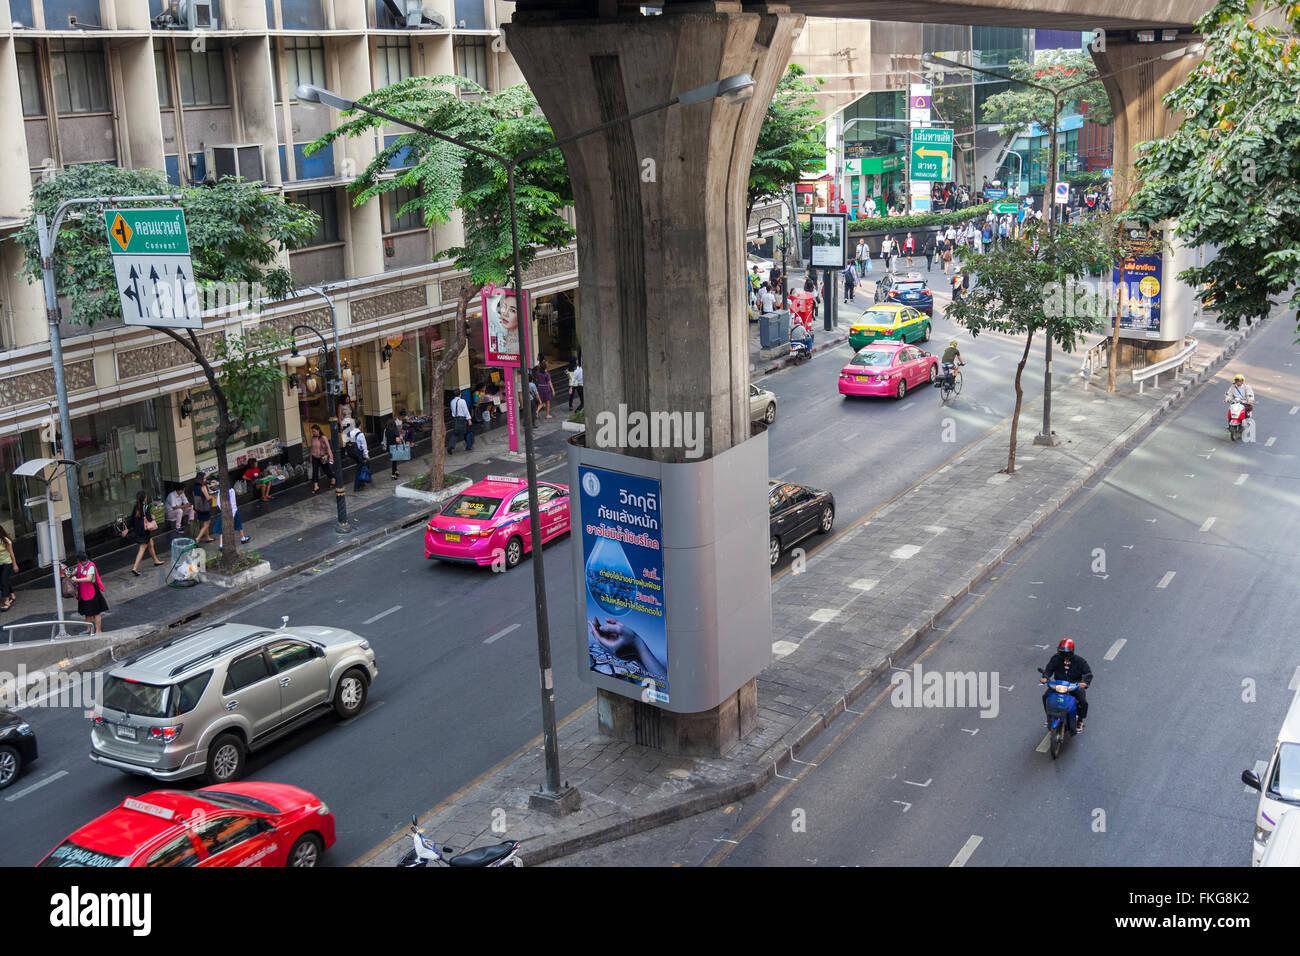 The Sala Daeng street (Bangkok) on weekdays with its usual traffic. La rue Sala Daeng en semaine avec son trafic - Stock Image